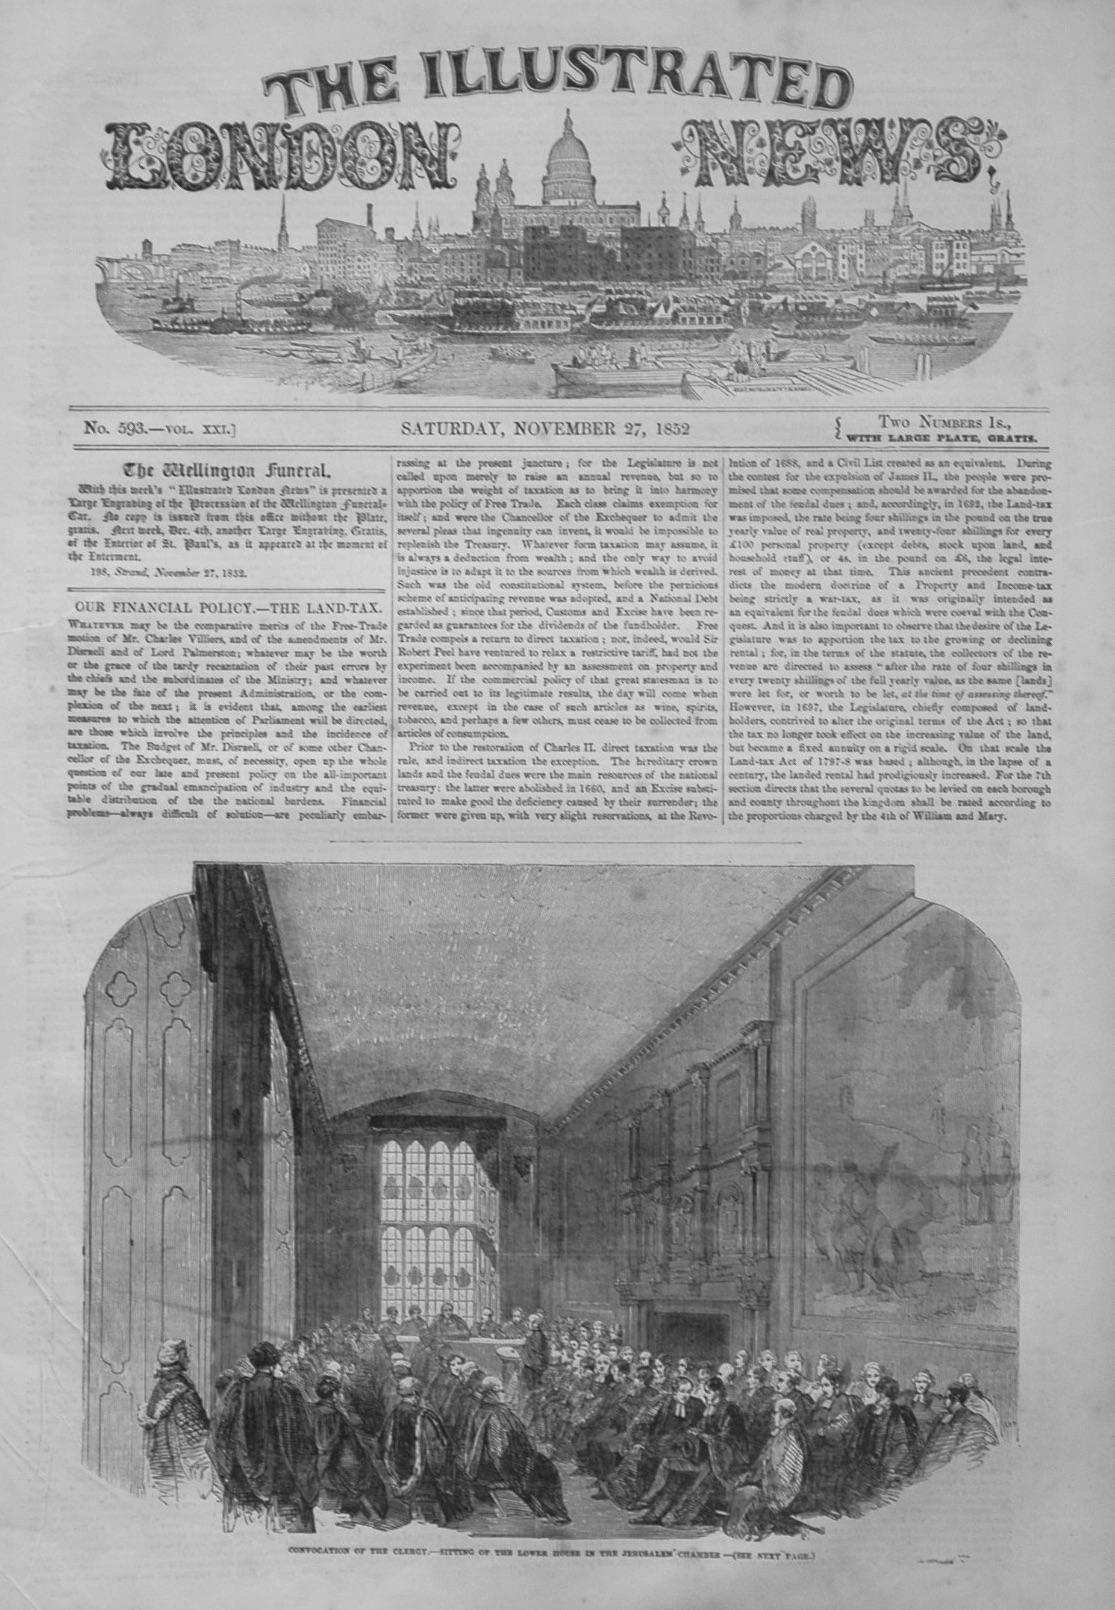 Illustrated London News, November 27, 1852.